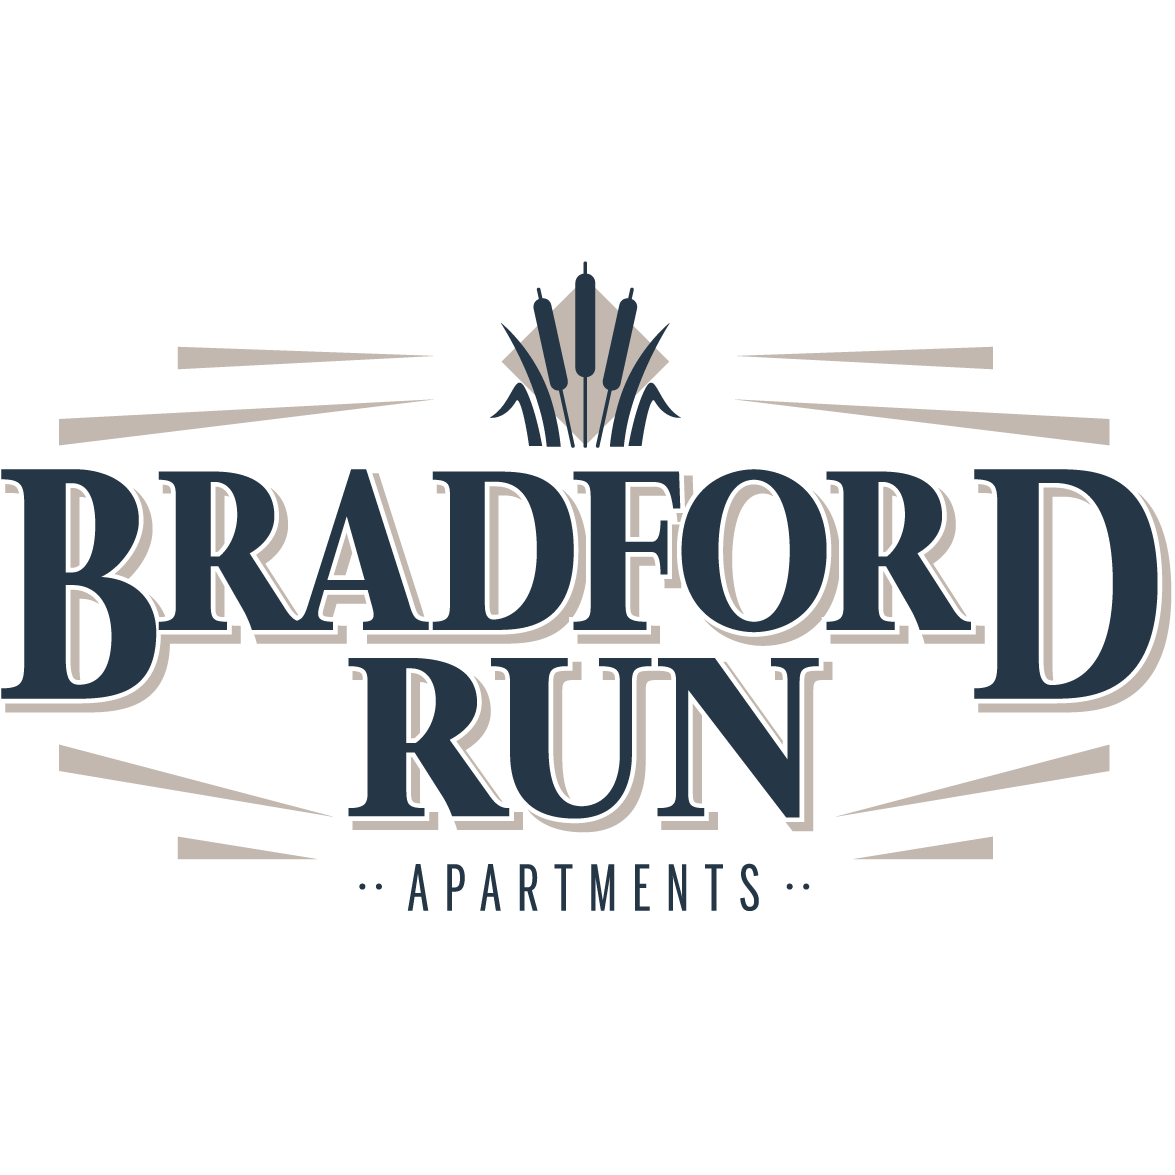 Bradford Run Apartments